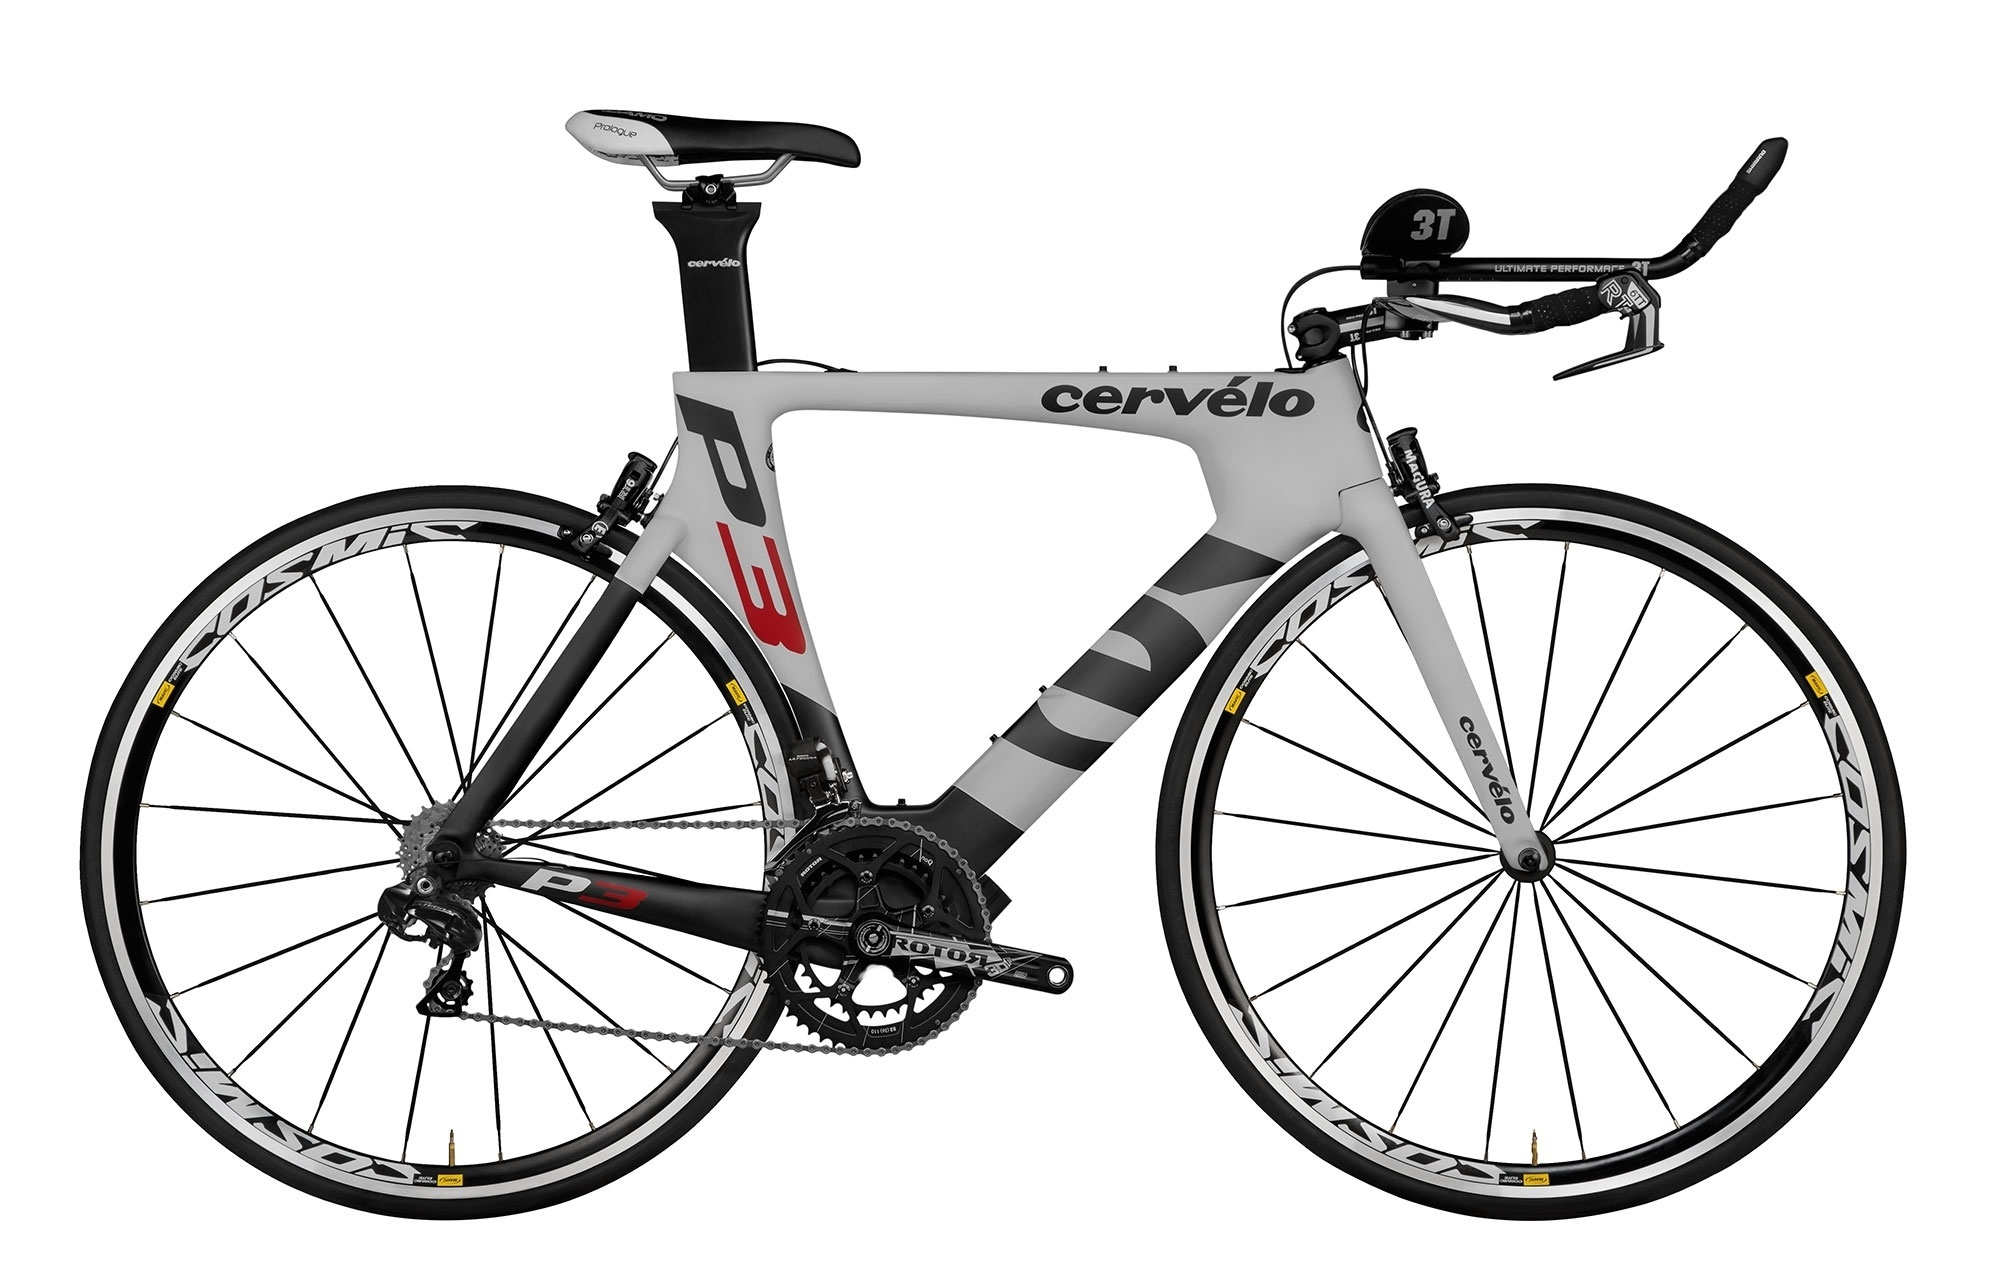 2014 Cervelo P3 Ultegra Di2 Bike R Amp A Cycles